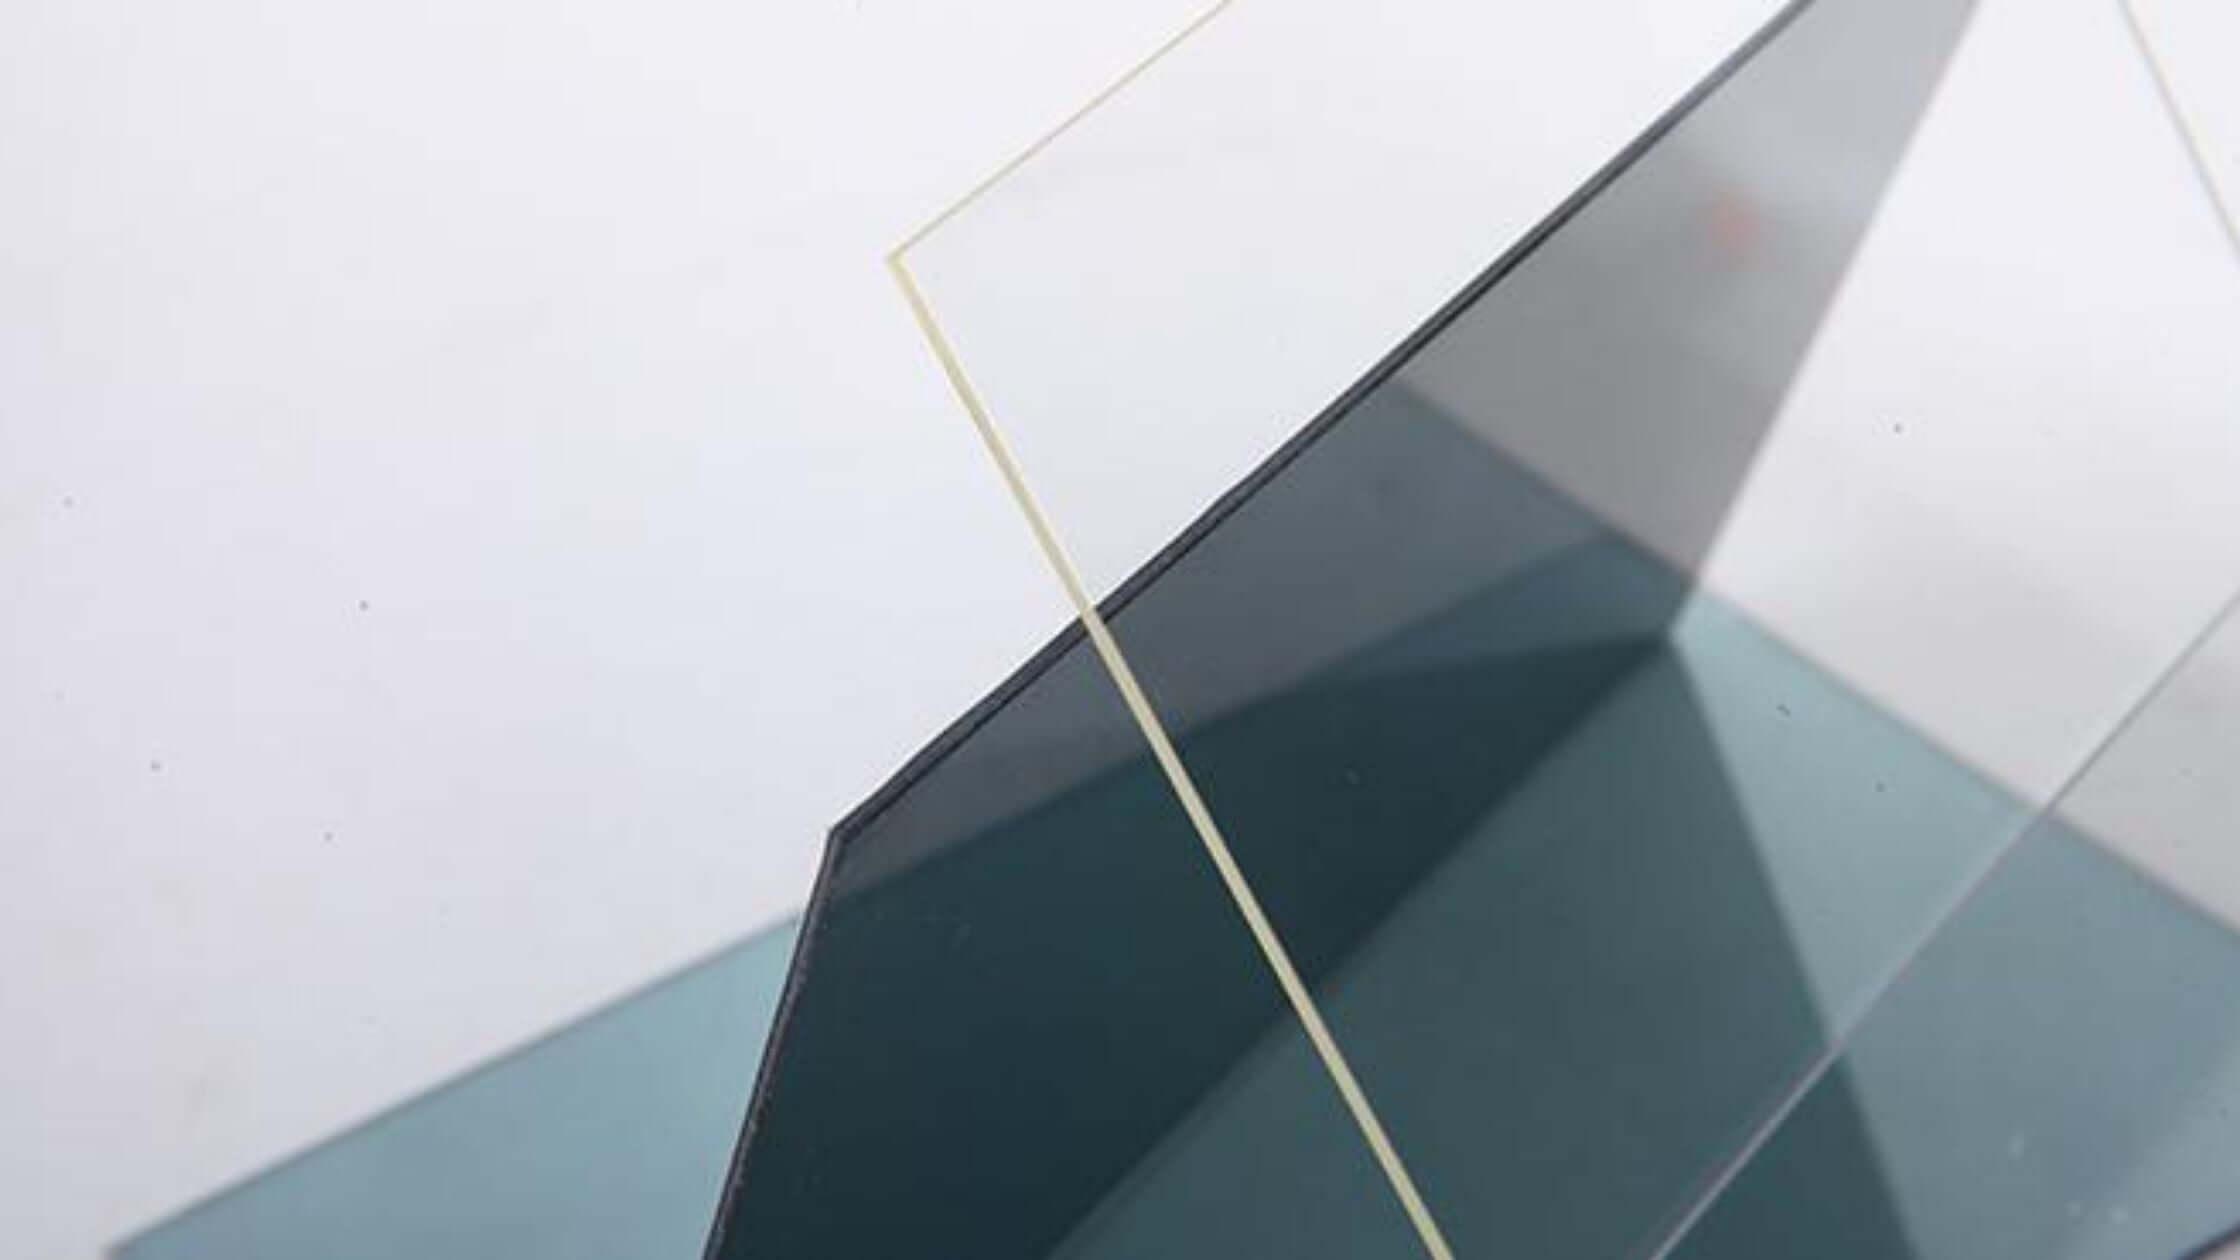 plastic sheetspetgPVC SheetSunboard SheetPolystyrene Sheet